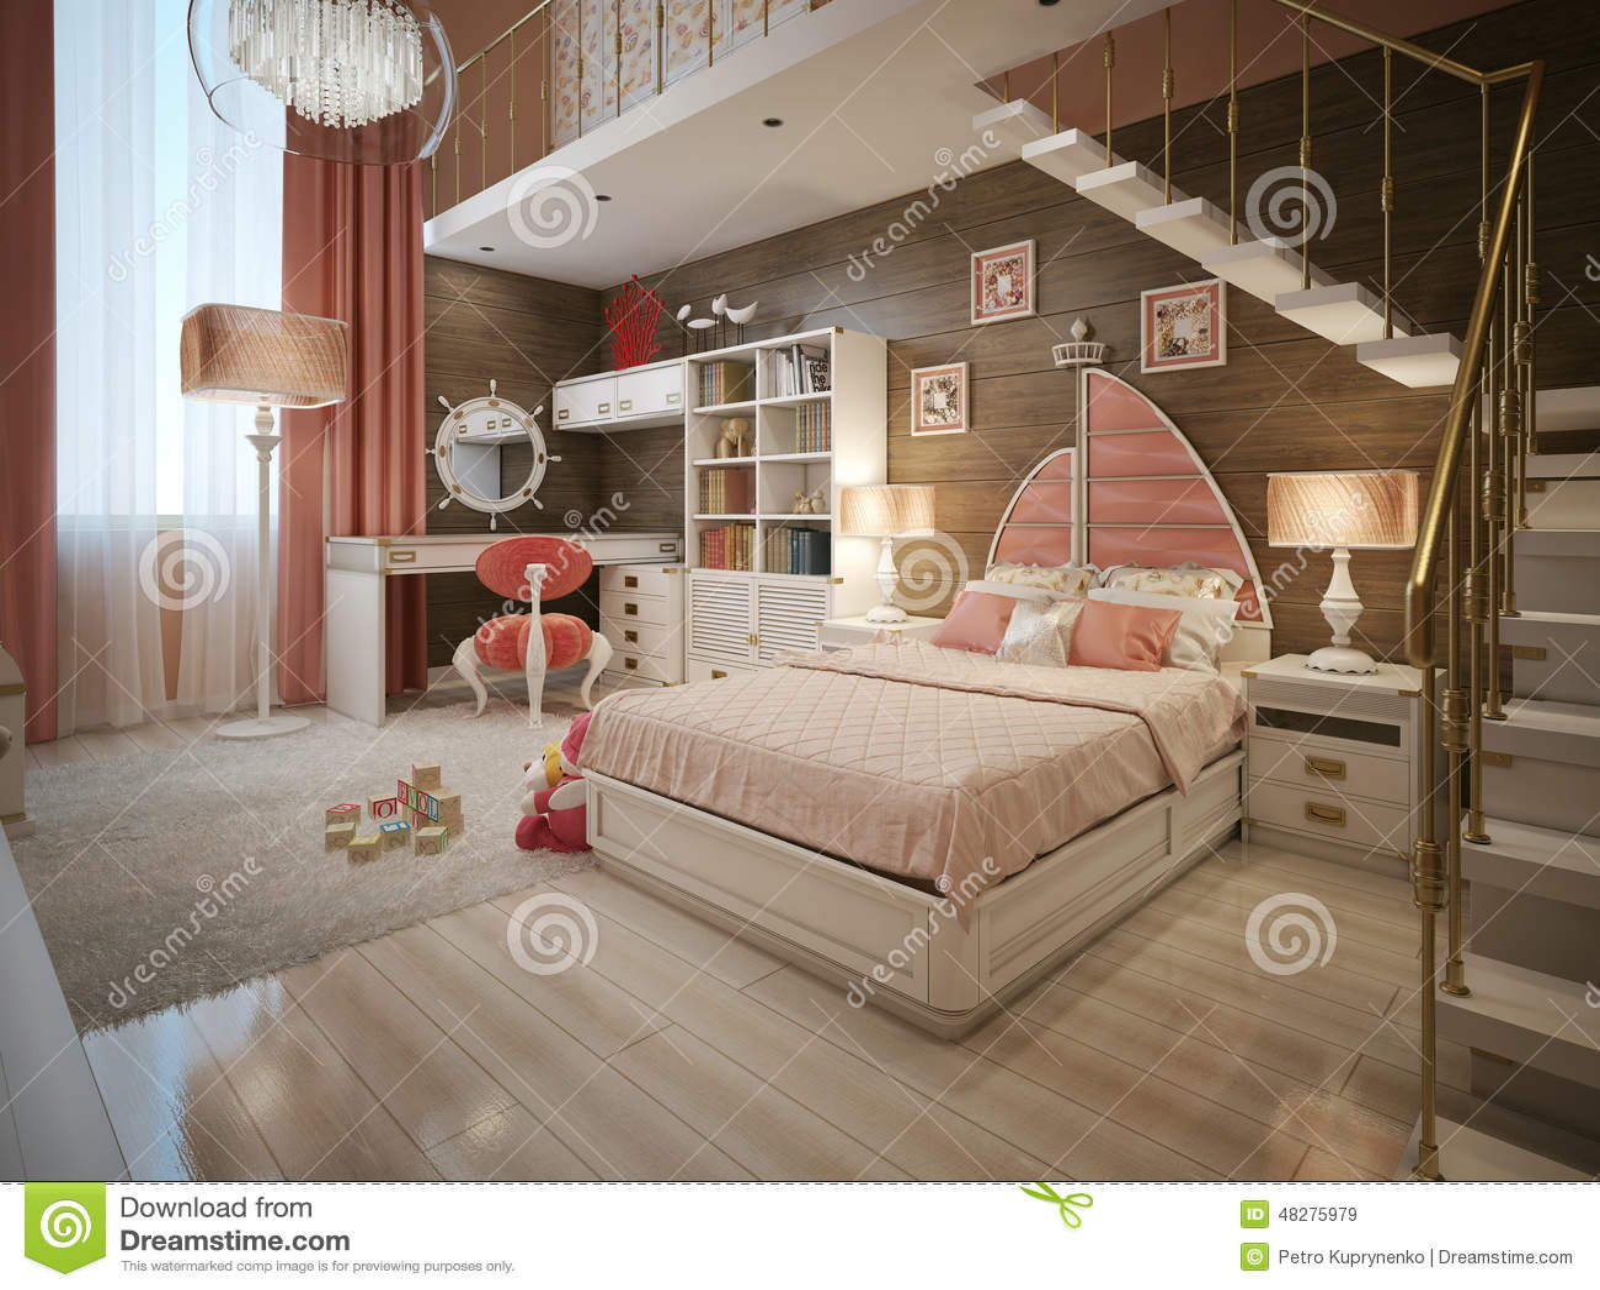 Meisjesslaapkamer in neoklassieke stijl stock illustratie